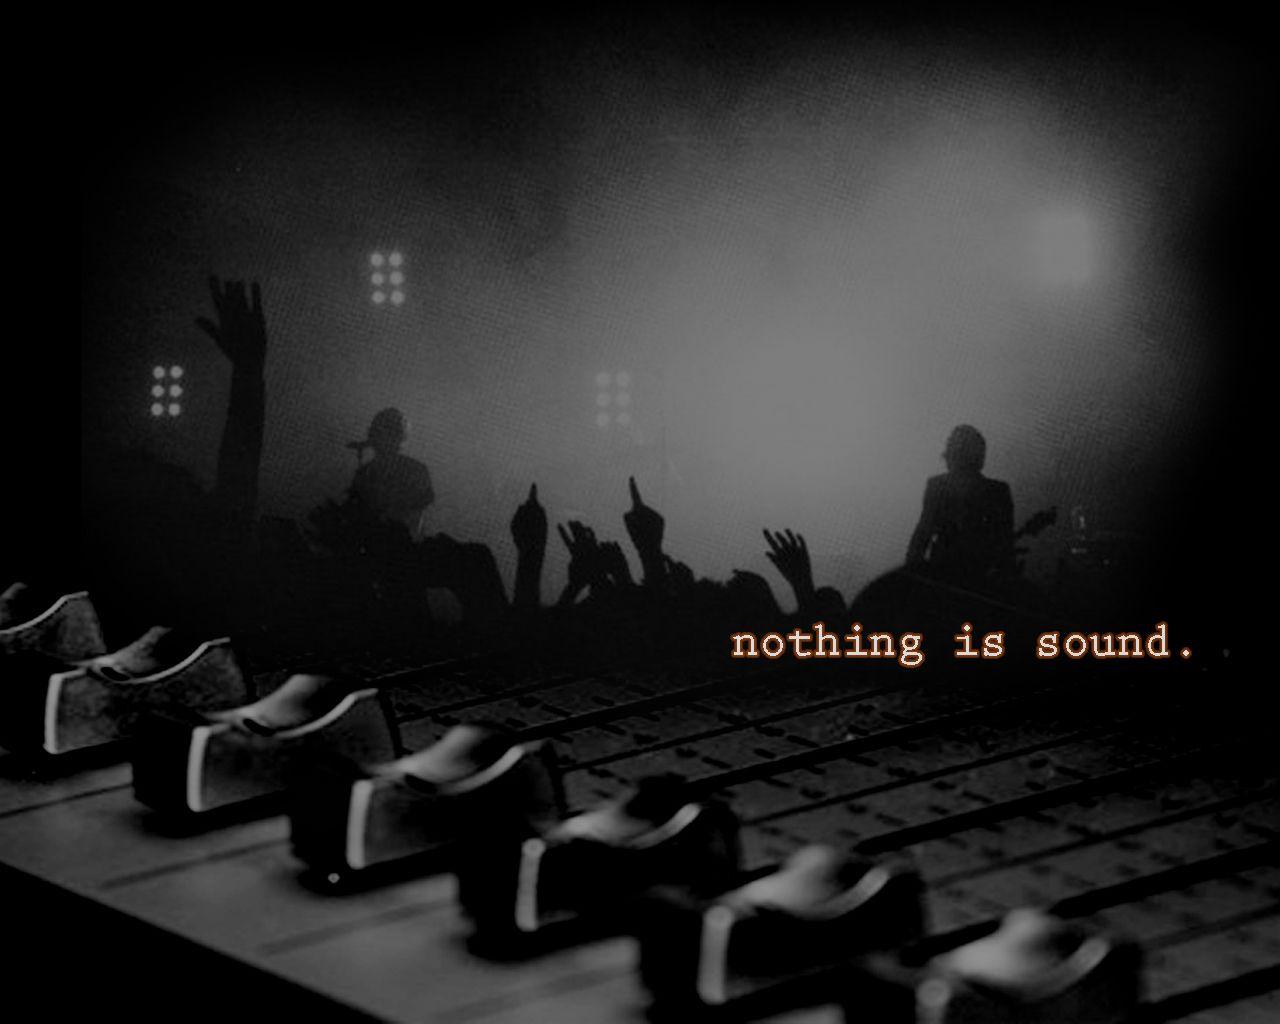 Nothing Is Sound Wallpaper Image Wallpaper WallpaperLepi 1280x1024